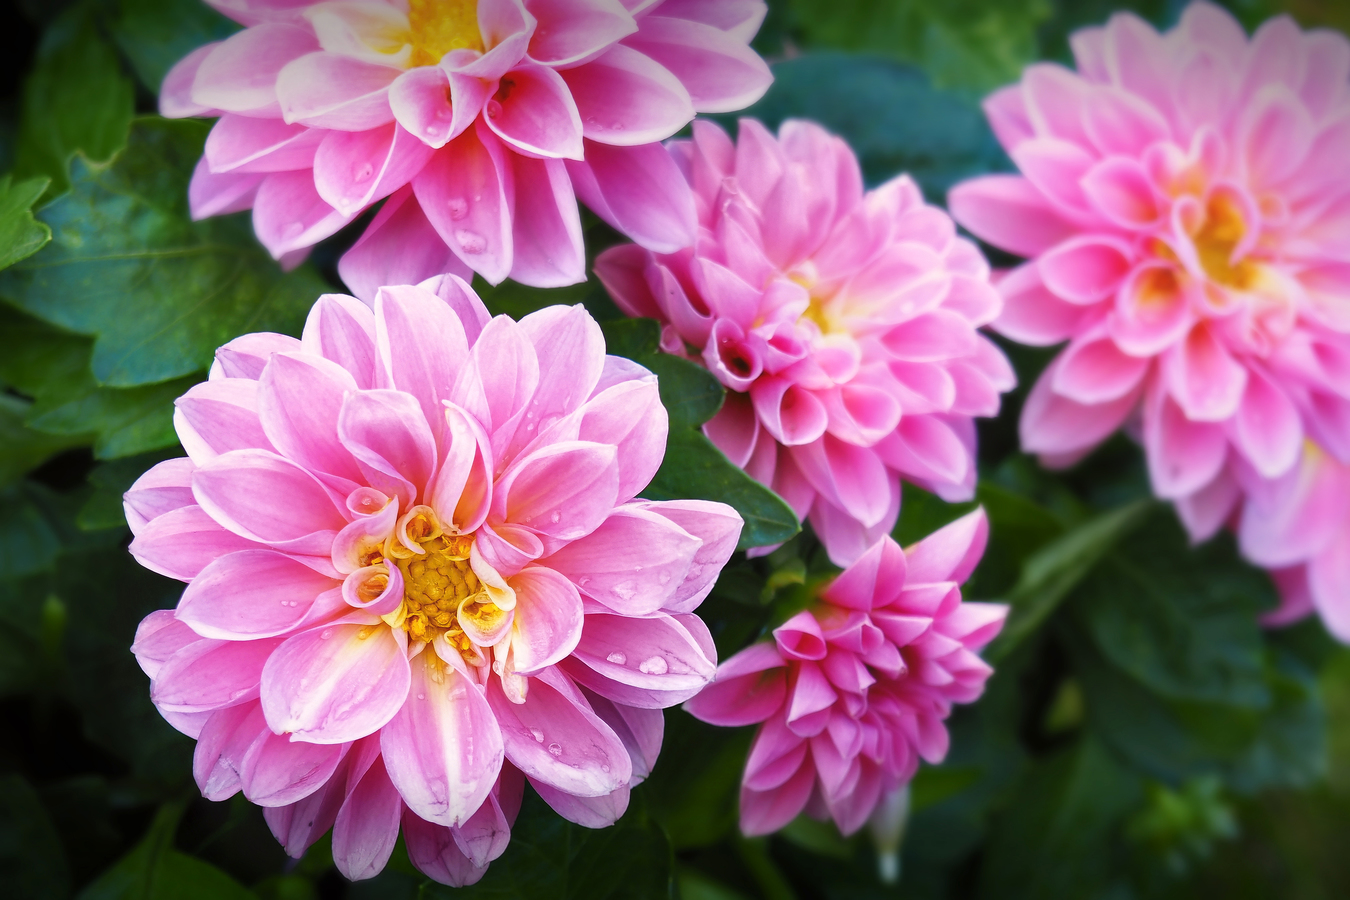 Krásné květy matčiných kytek